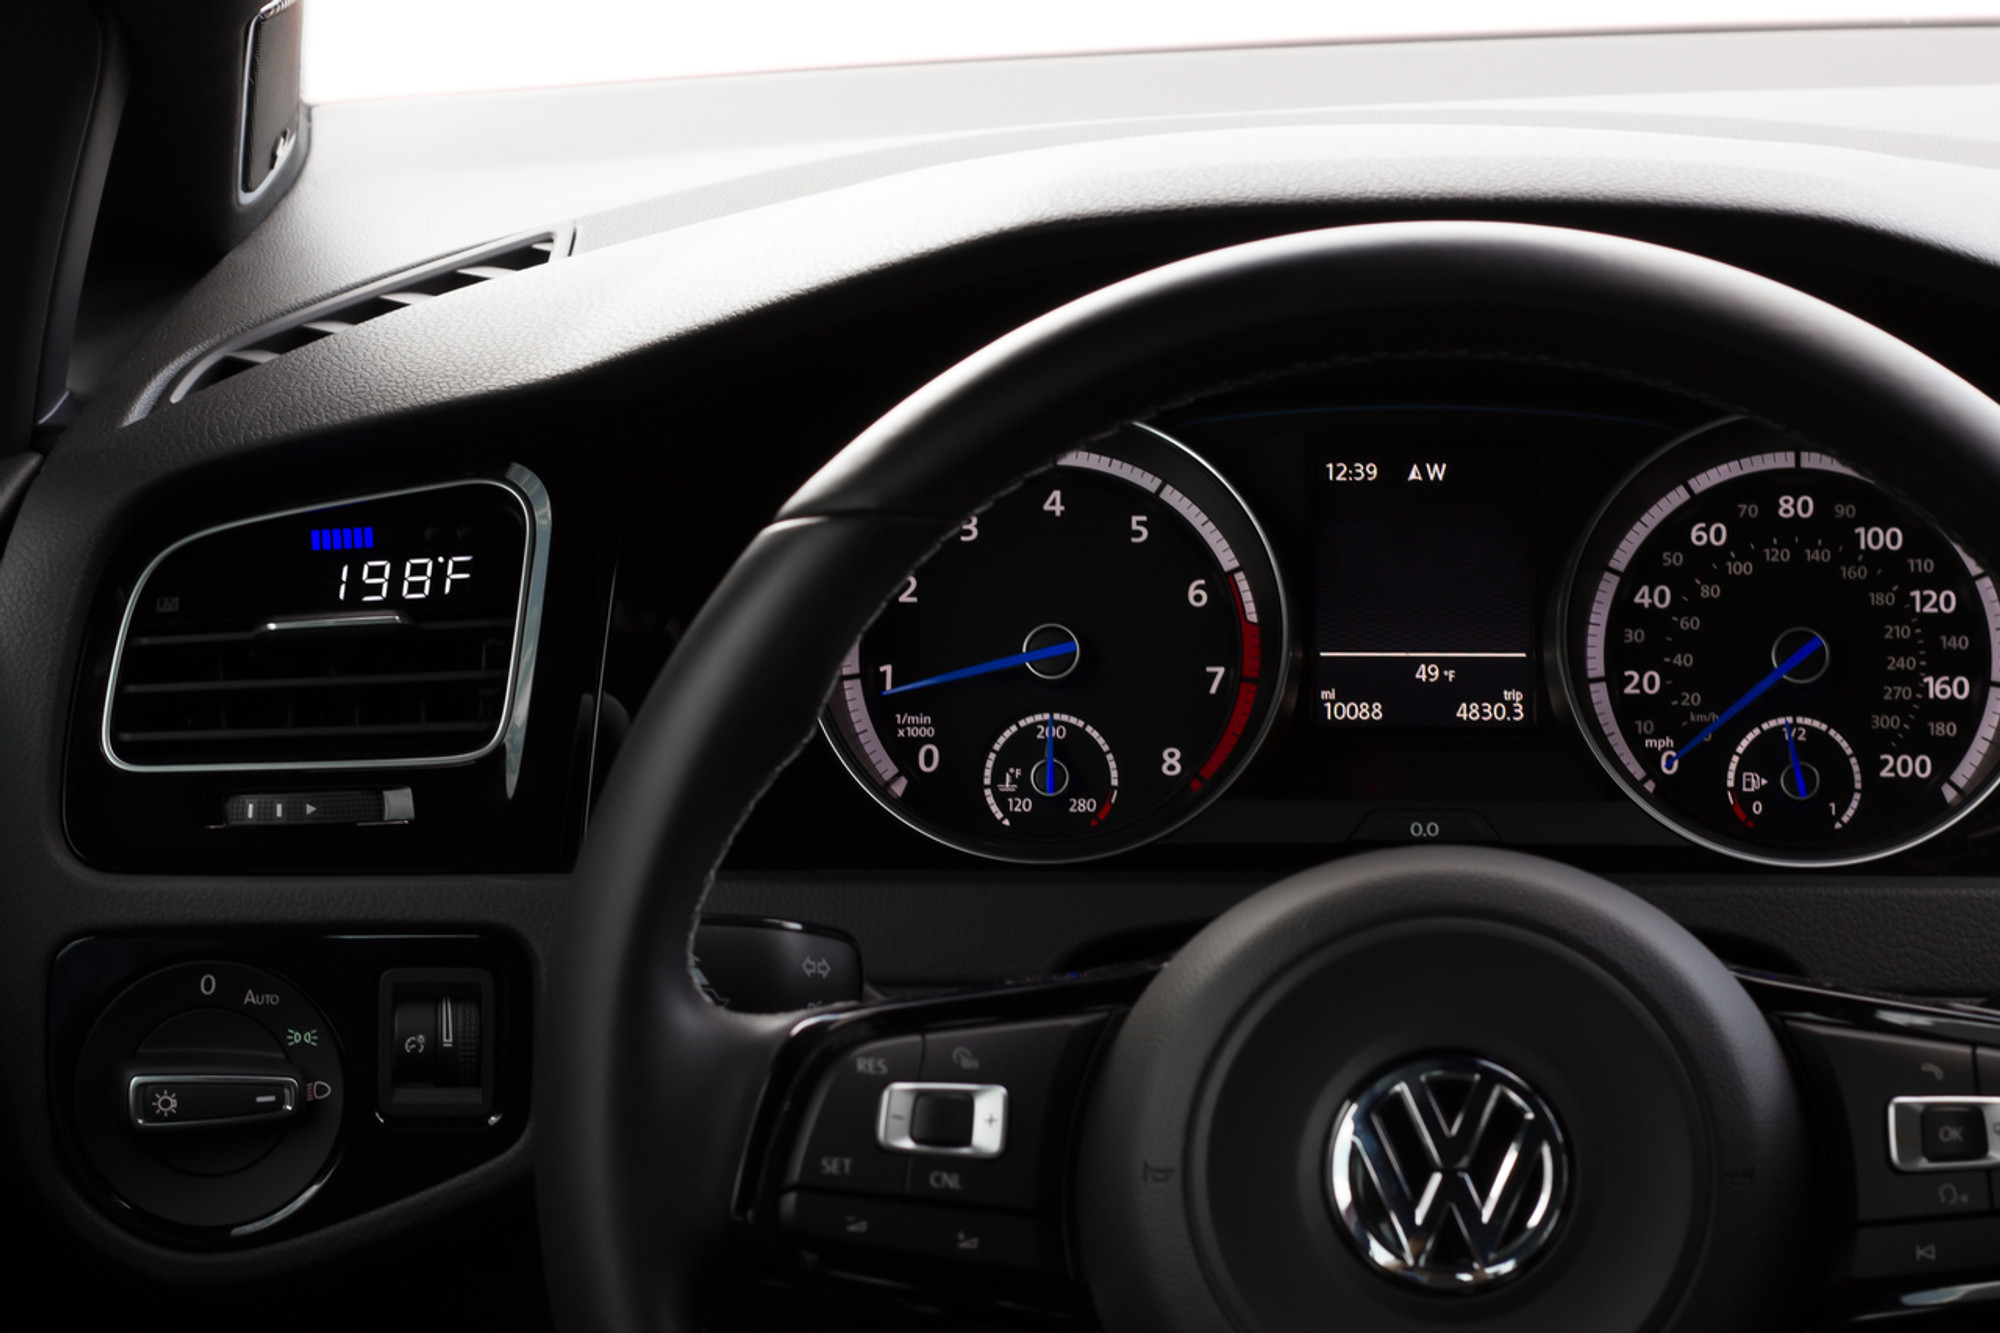 VW Mk7 - P3 OBD2 Multi-Gauge